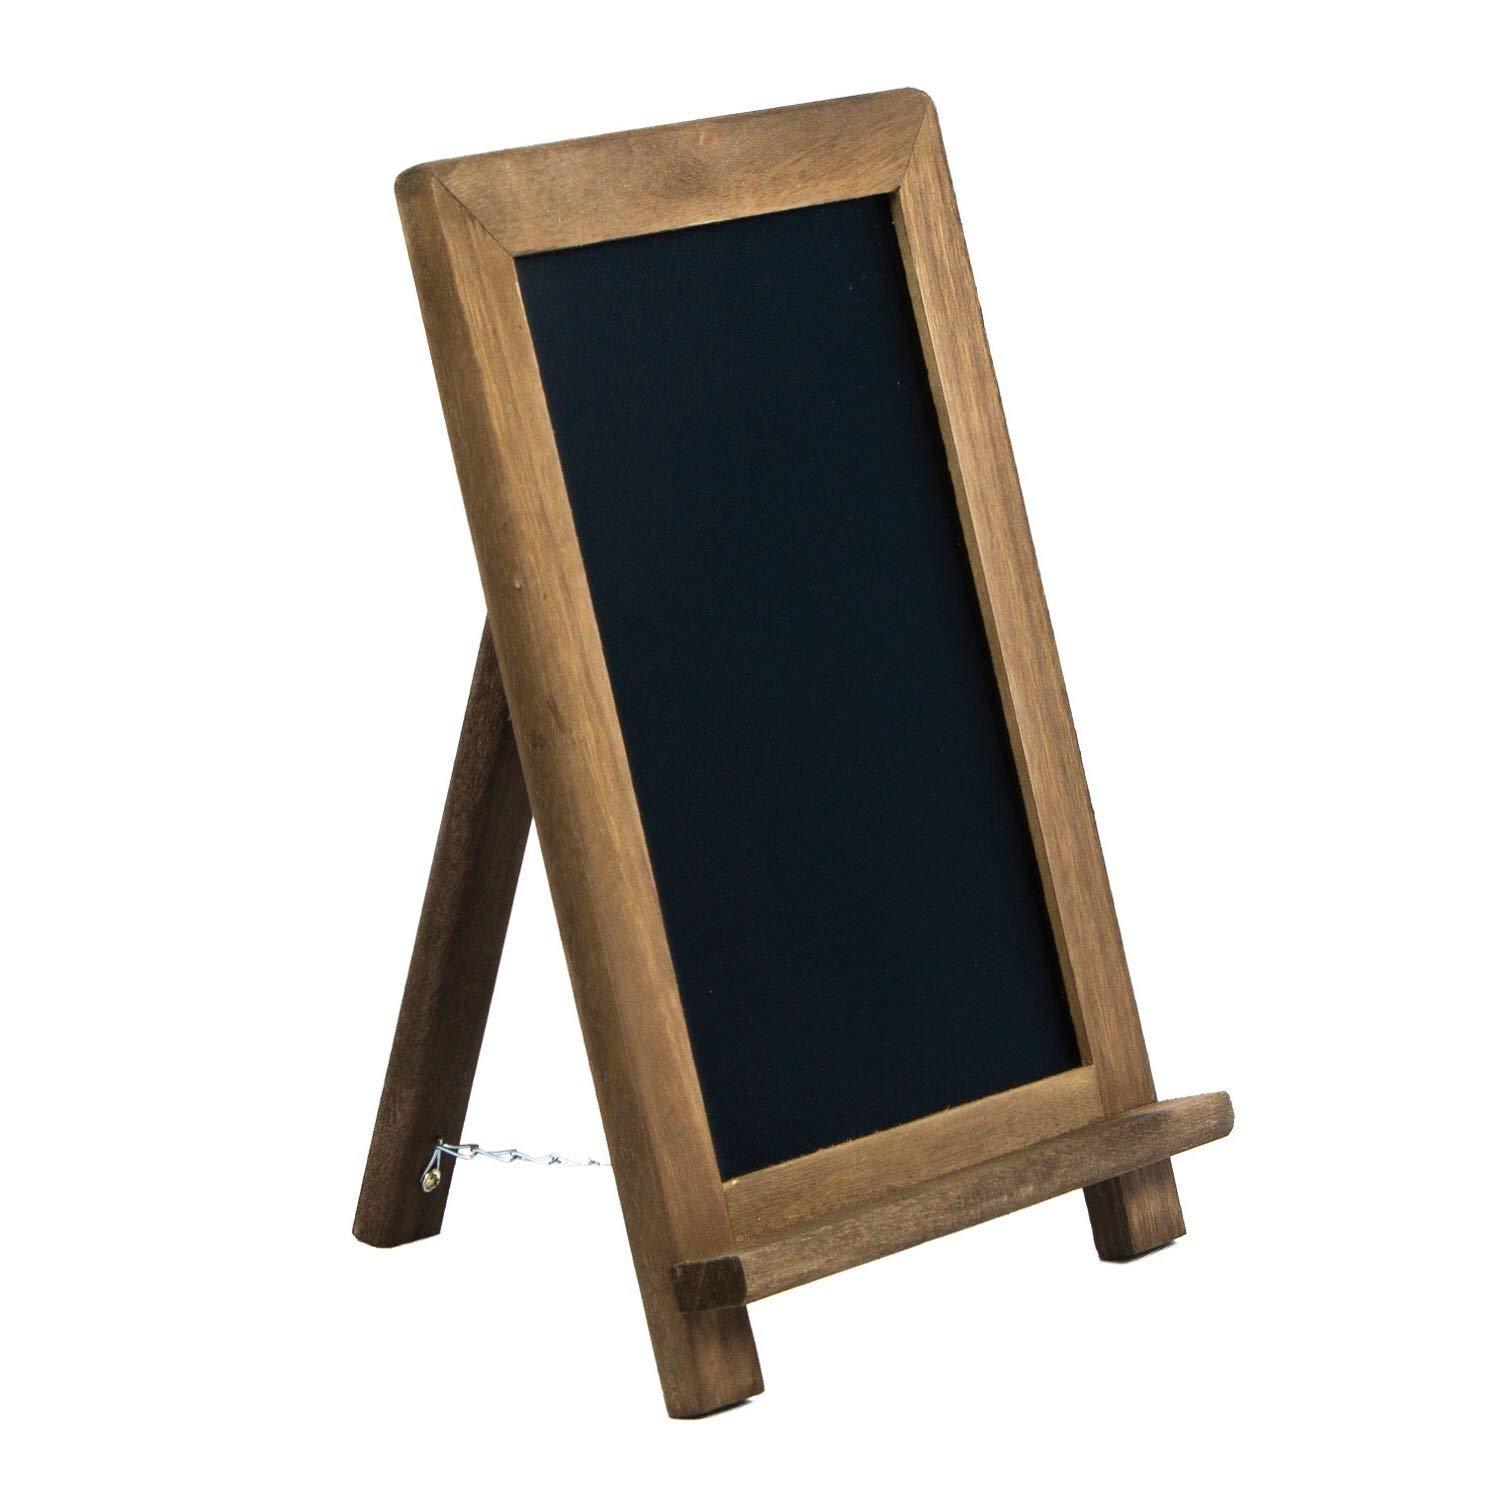 VersaChalk Rustic Wooden Framed Standing Chalkboard Sign